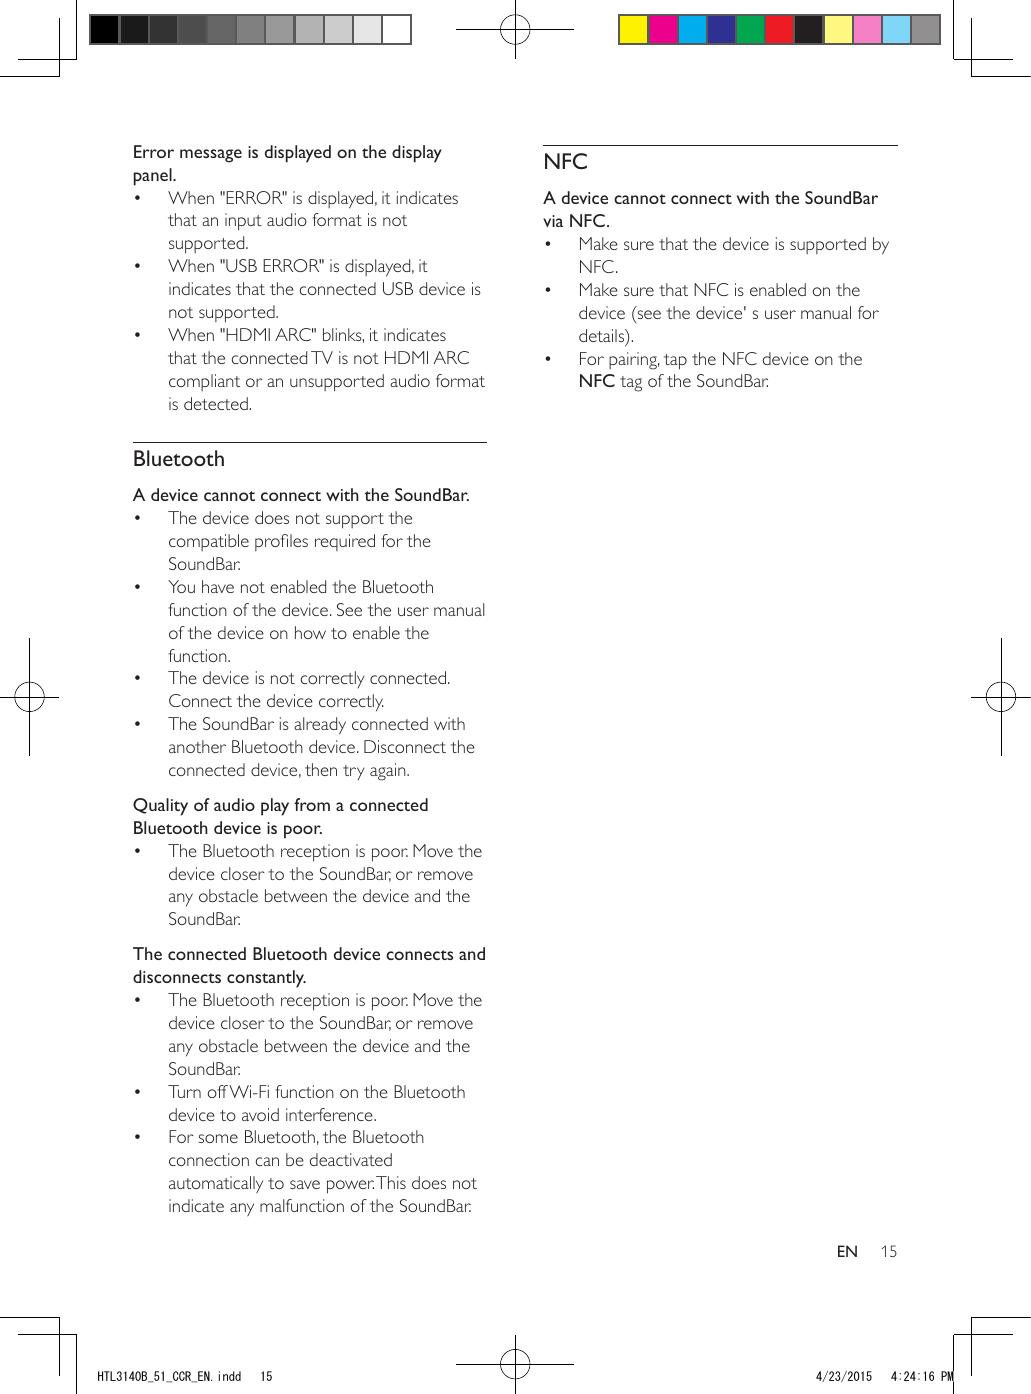 Philips HTL3140B/51 User Manual Htl3140b 51 Dfu Aen